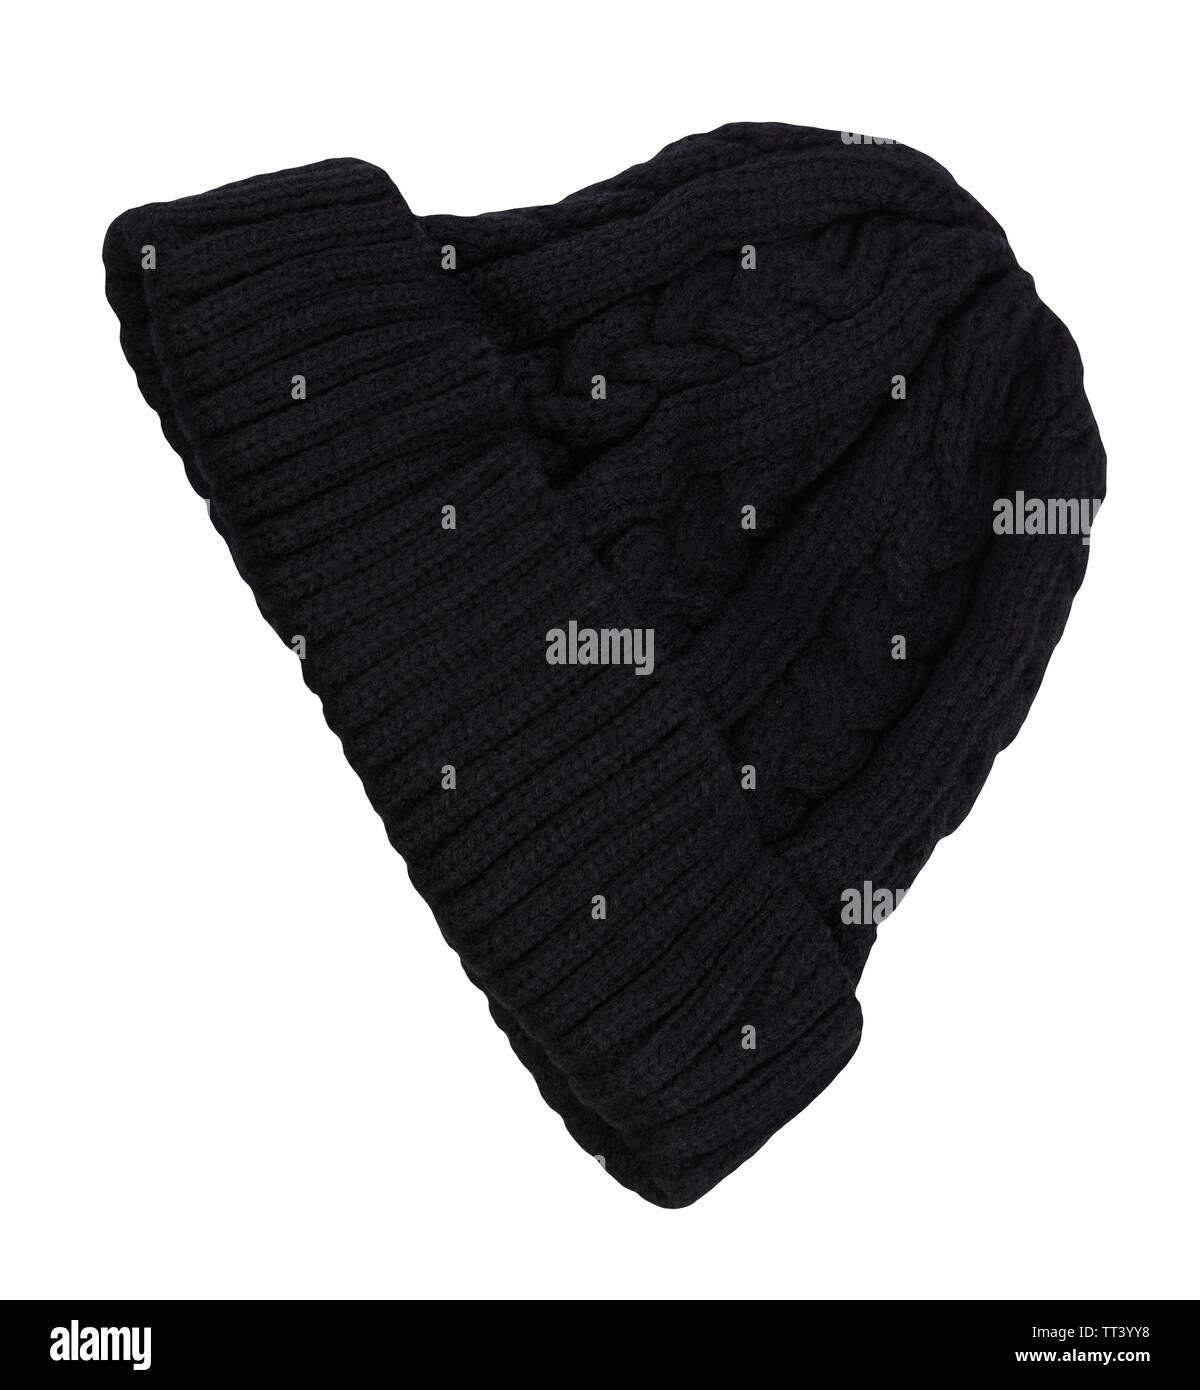 cfd6381d936bf5 Warm Men Black Cap Stockfotos & Warm Men Black Cap Bilder - Alamy